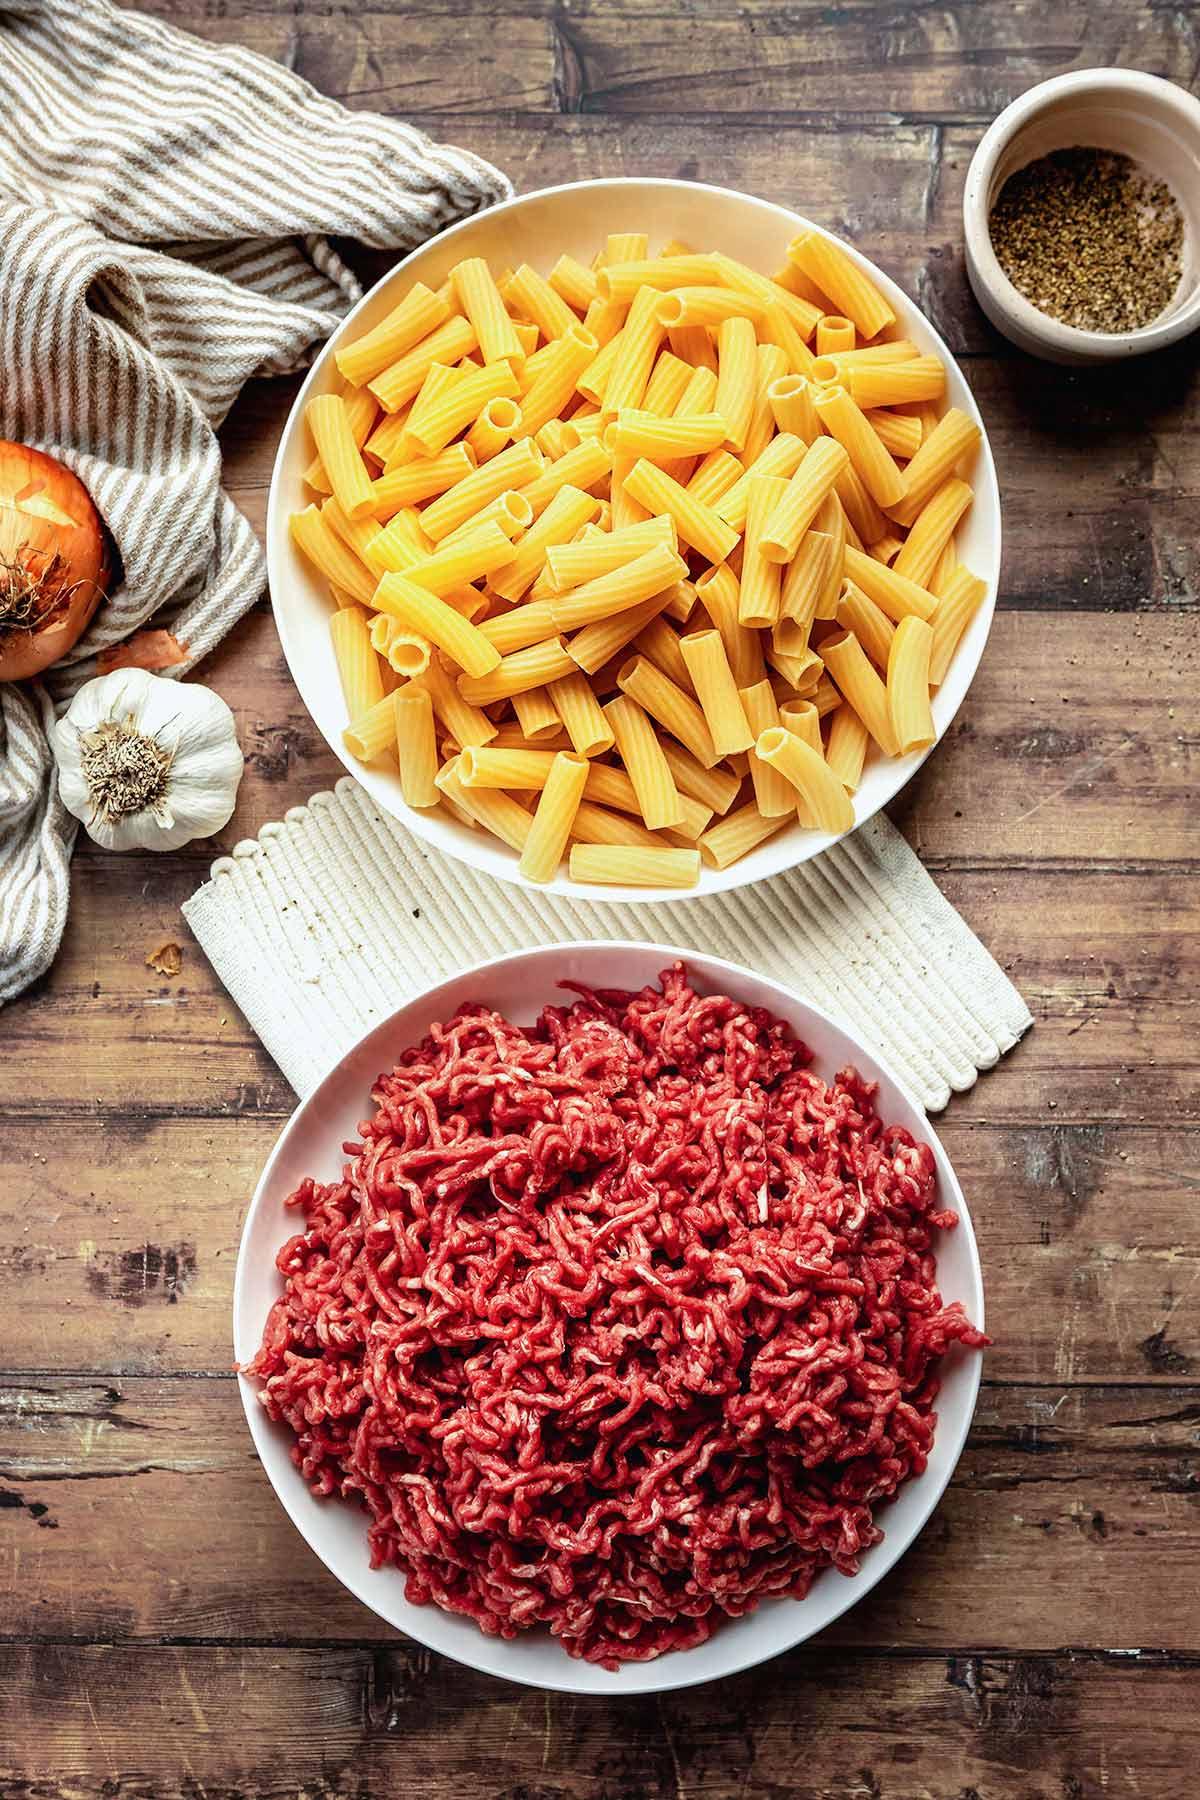 Cheesy Beef Pasta Bake ingredients in prep bowls